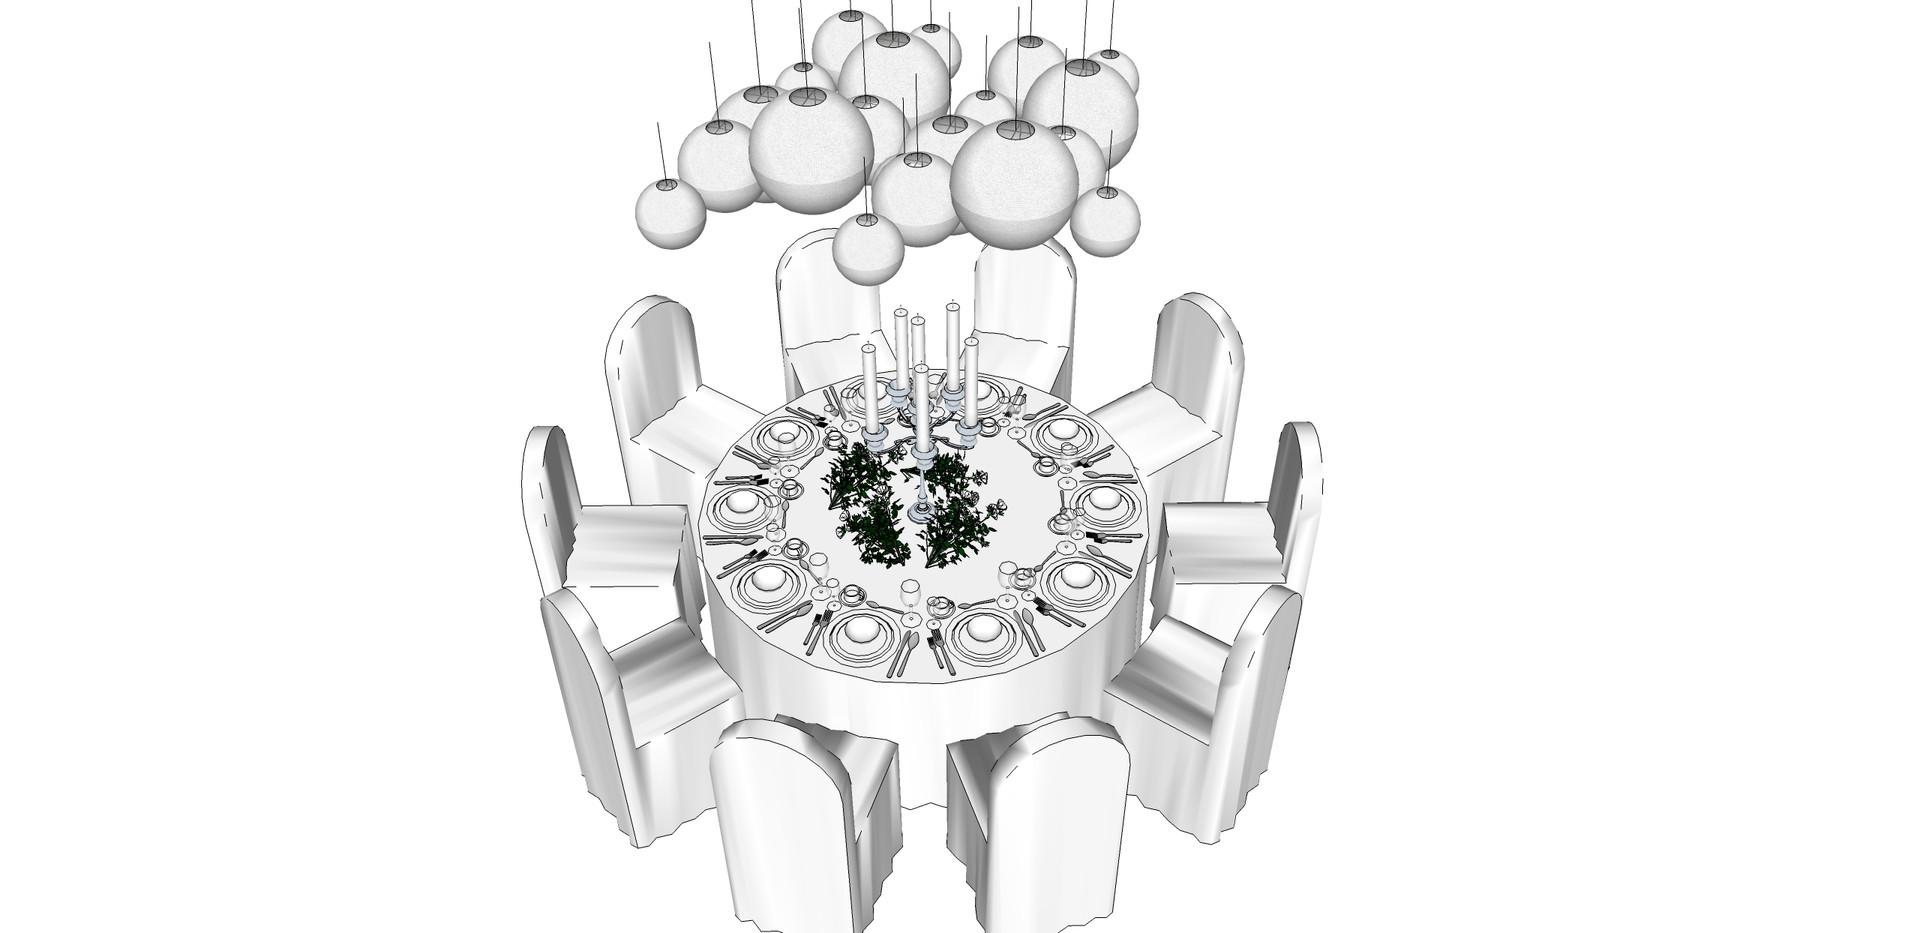 Table design 1.76m diamater 10 people